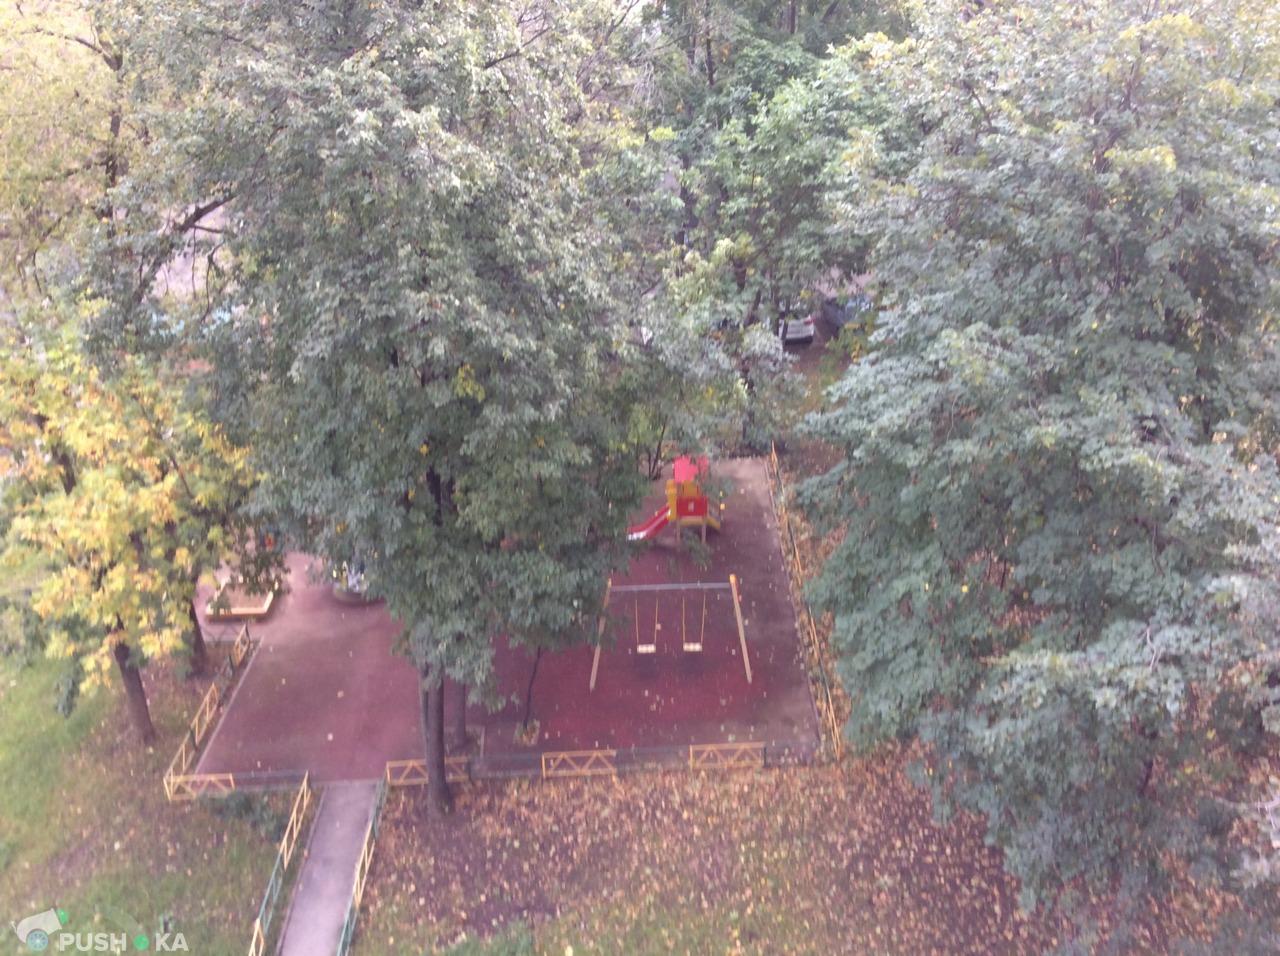 Купить однокомнатную квартиру г Москва, ул Академика Комарова, д 3А  - World Real Estate Service «PUSH-KA», объявление №247